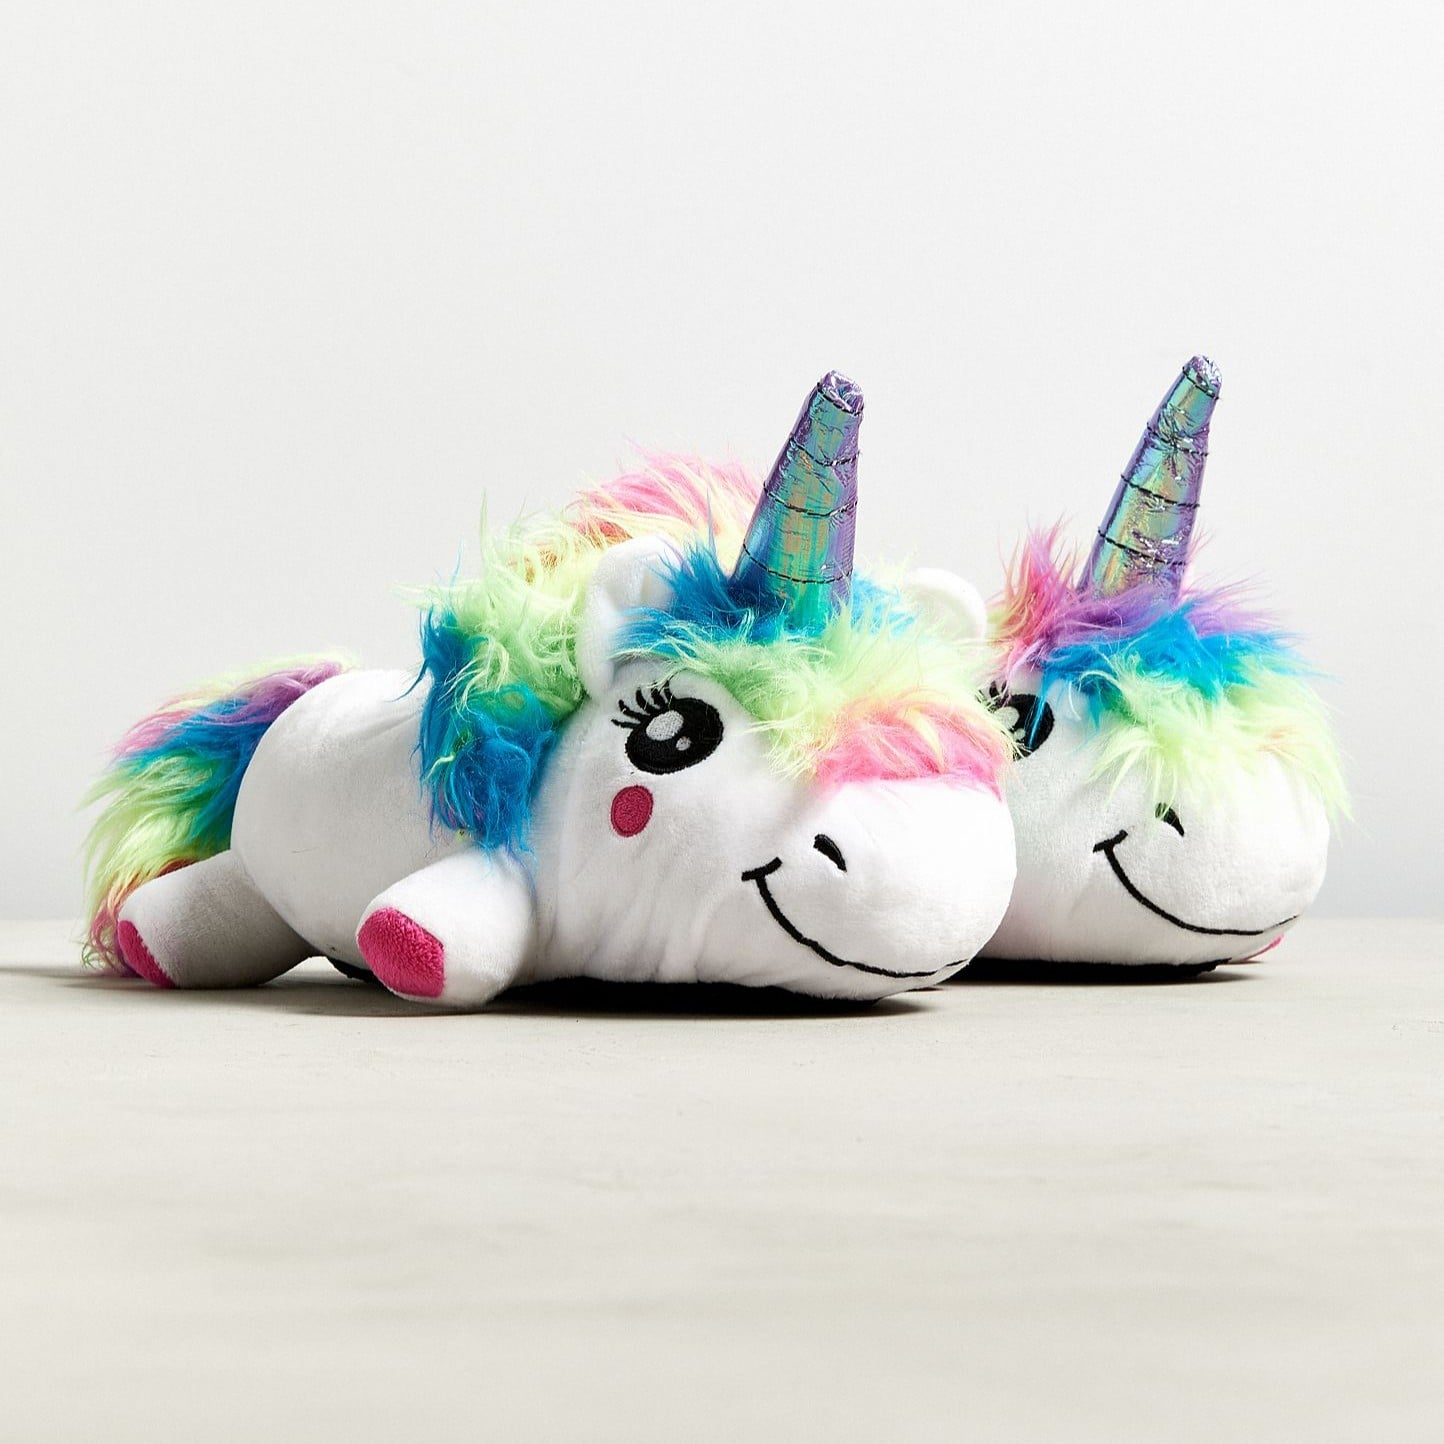 Rainbow and Unicorn Gifts  d0ed9733e05b